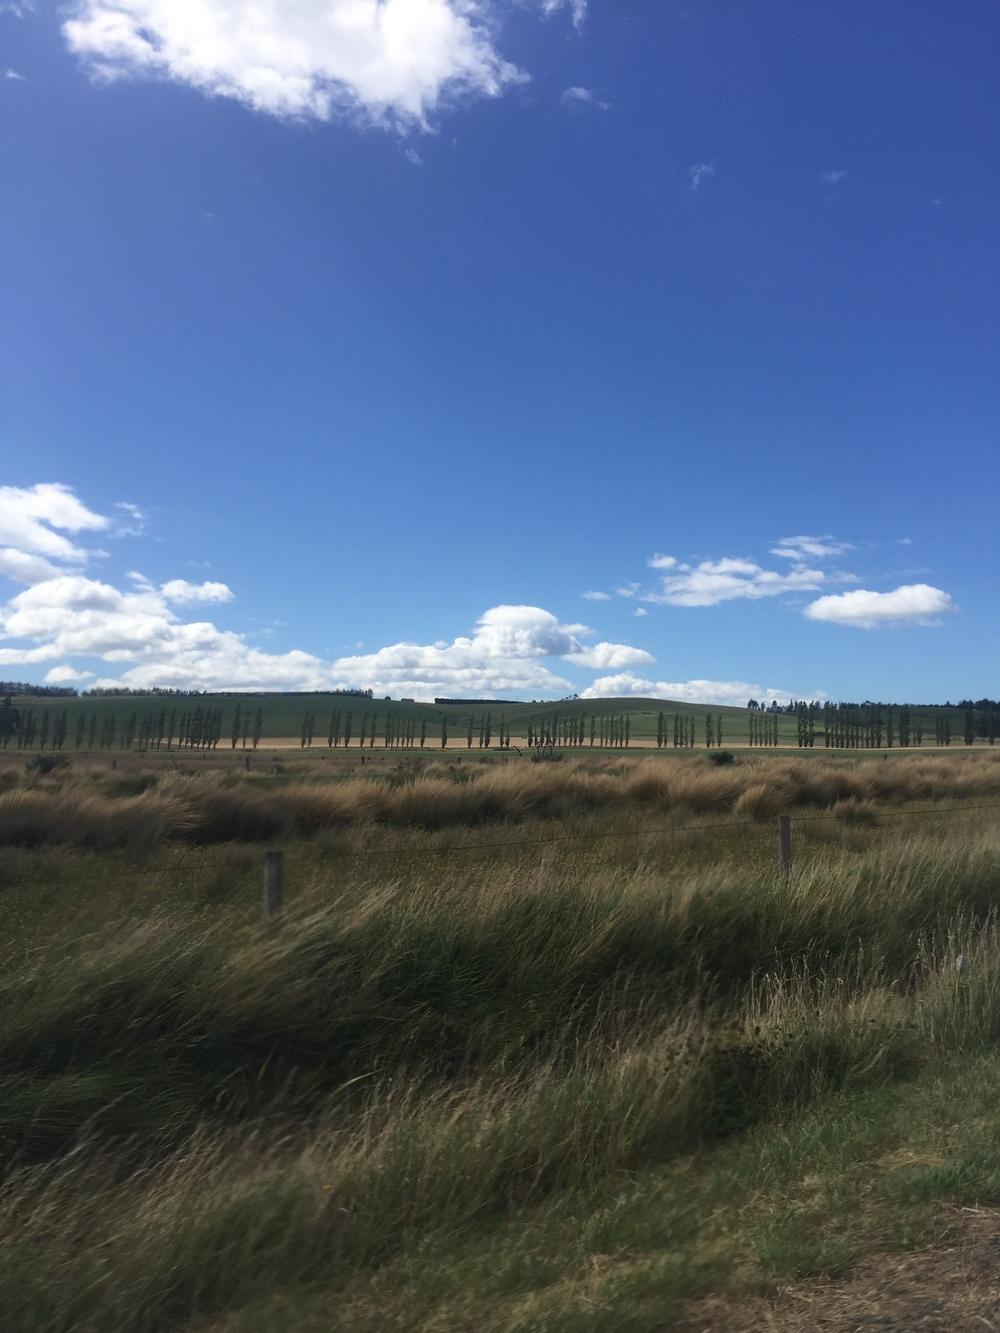 Drive back to Dunedin